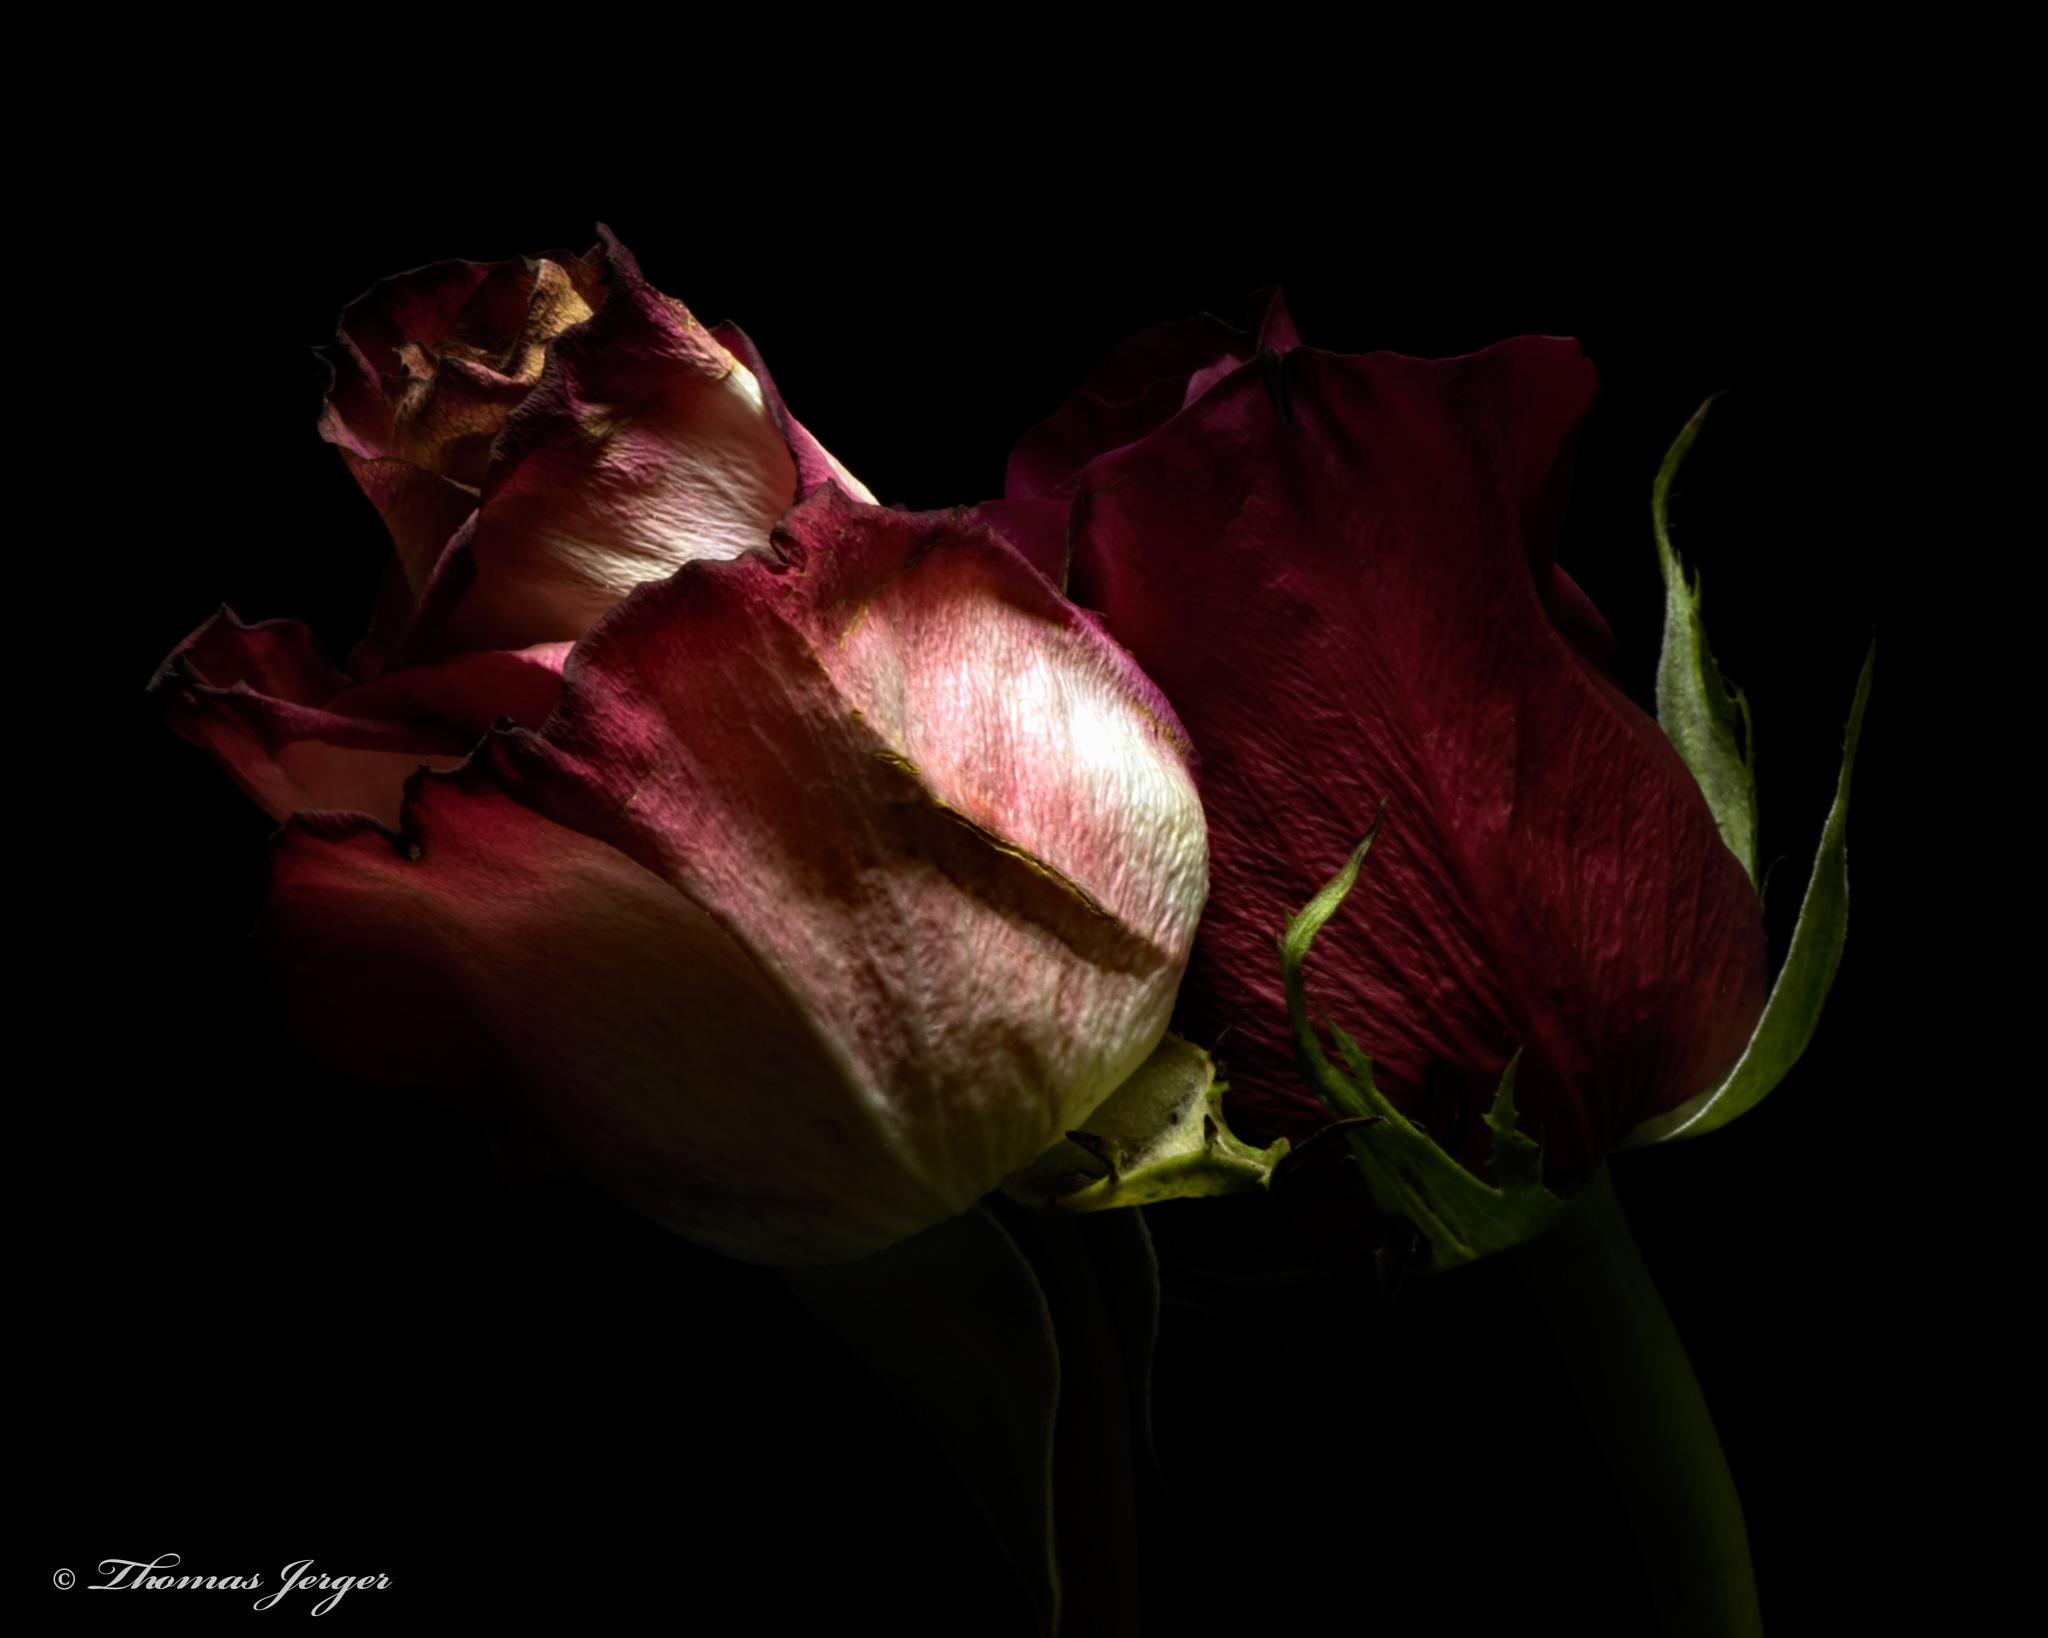 Mature Rose Couple 1017 by ThomasJerger